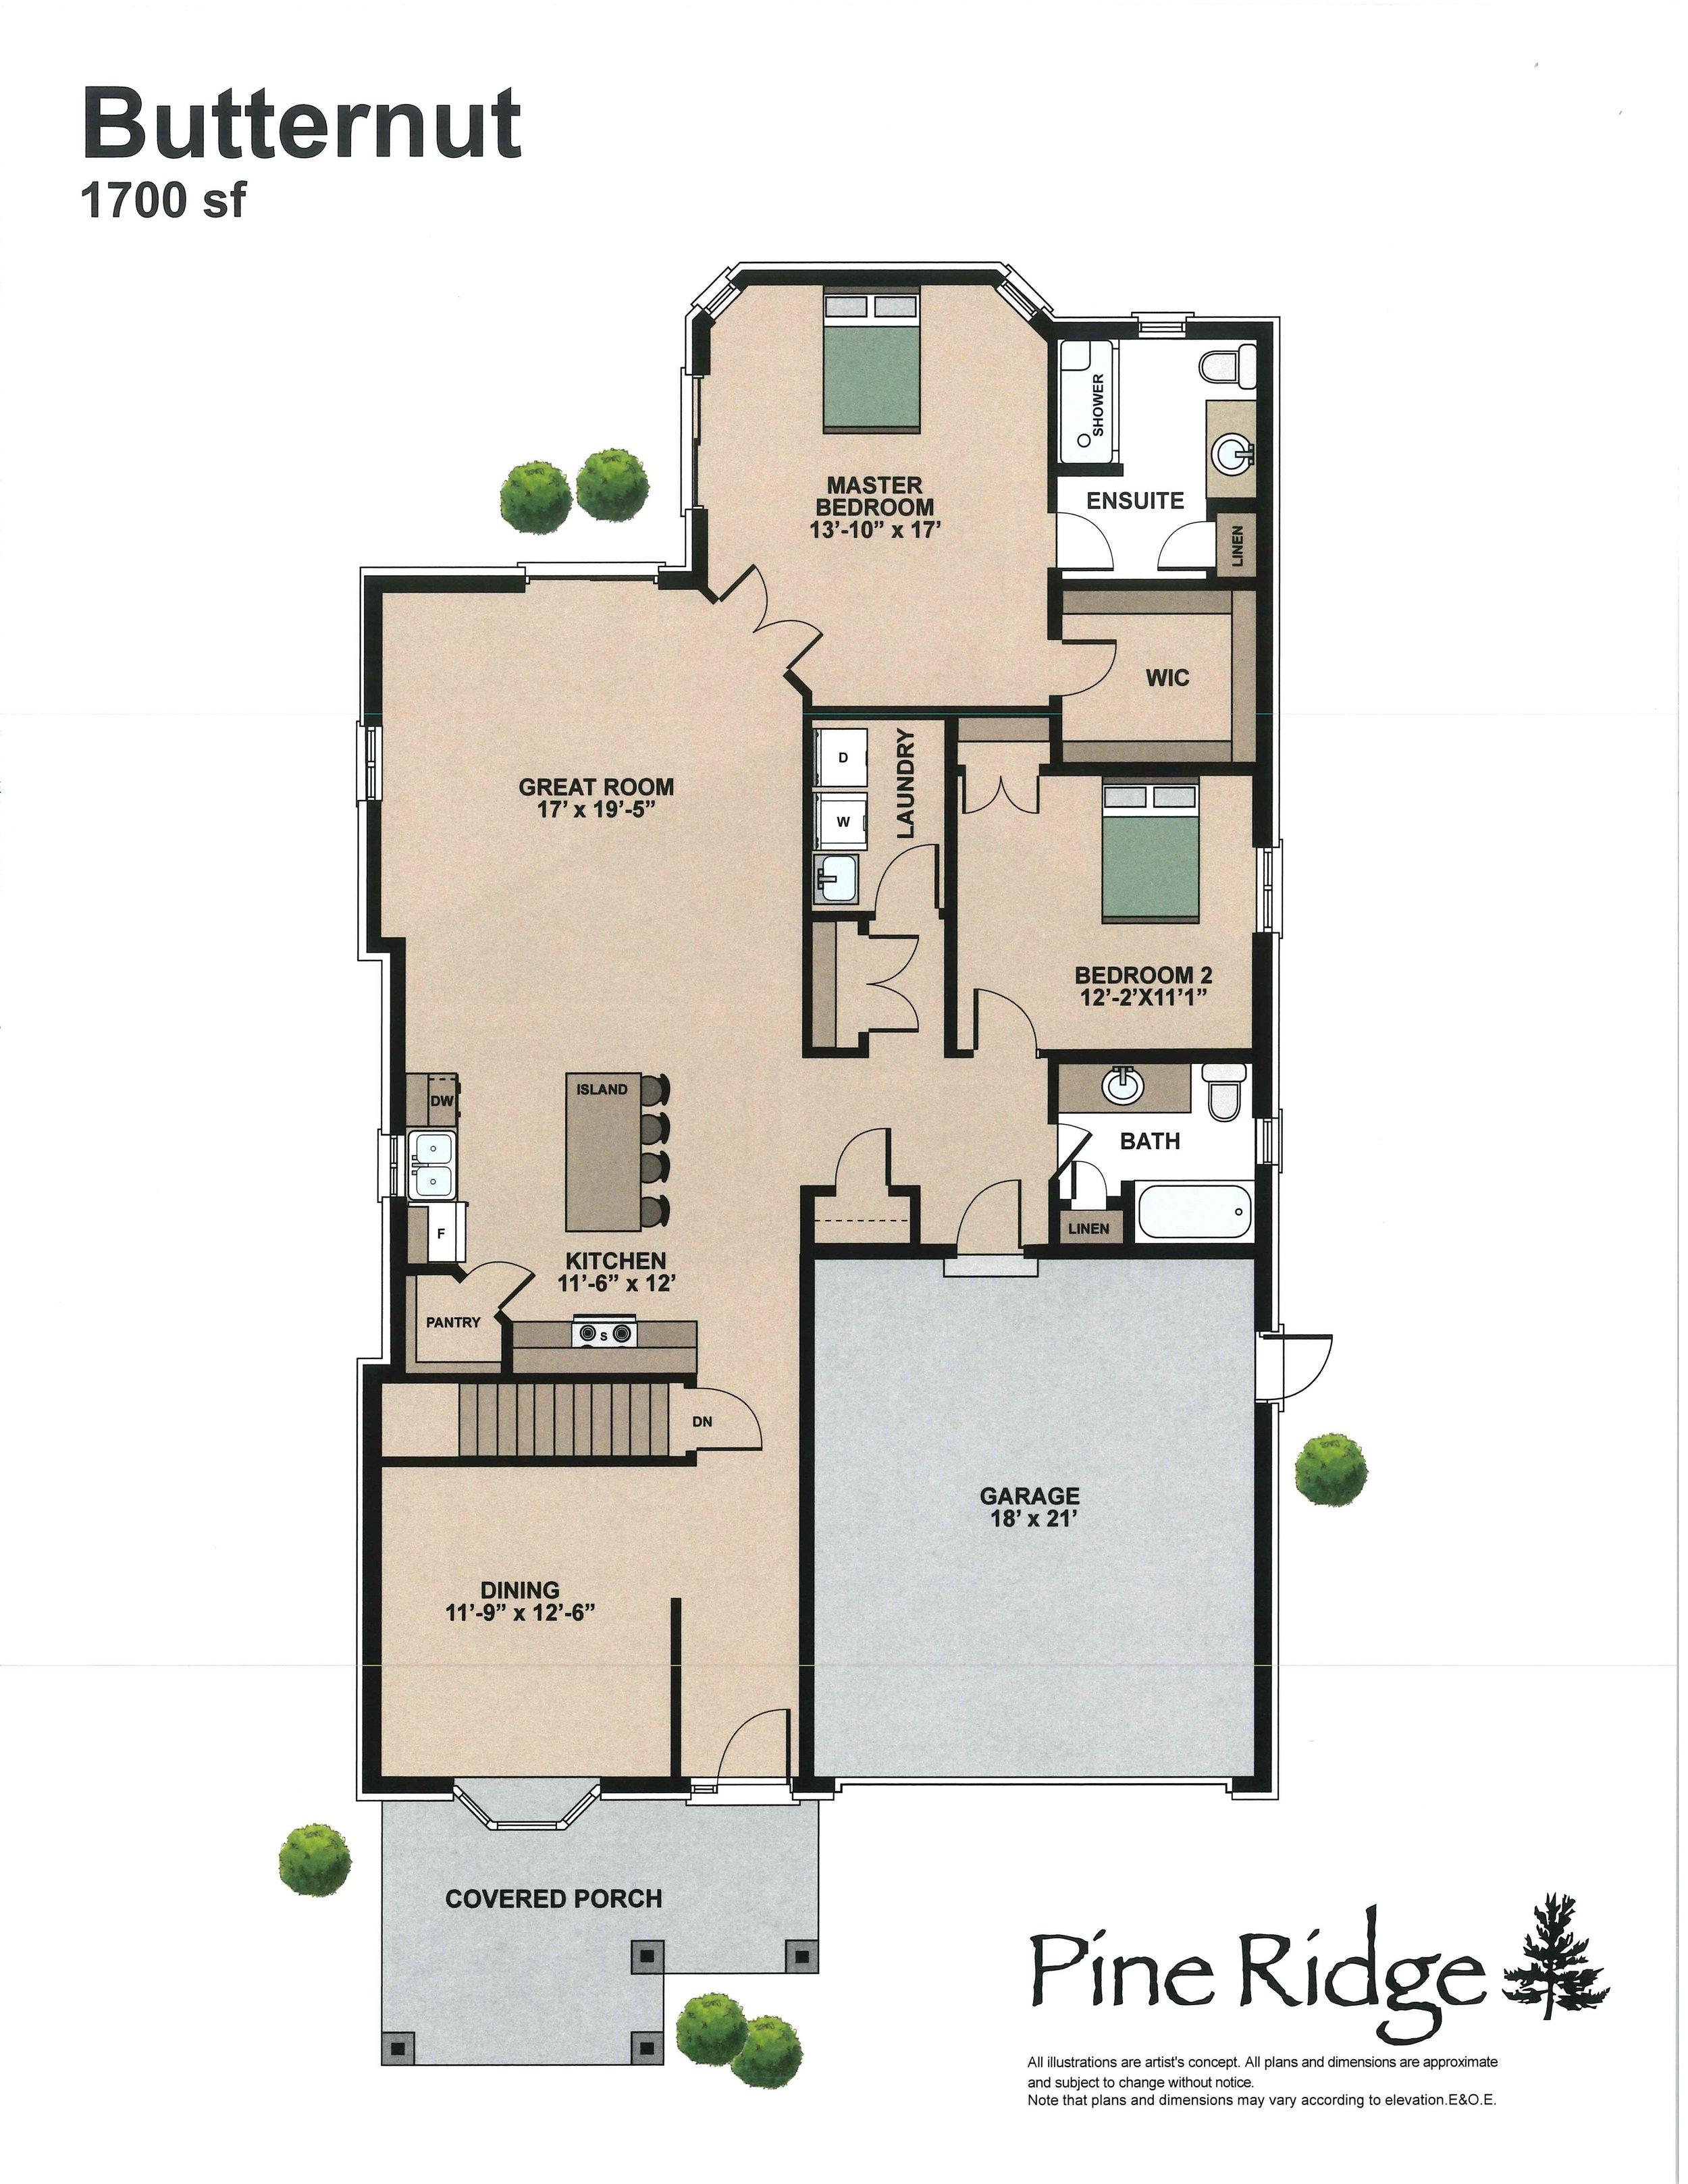 pineridge floorplans 1_Page_8.jpg